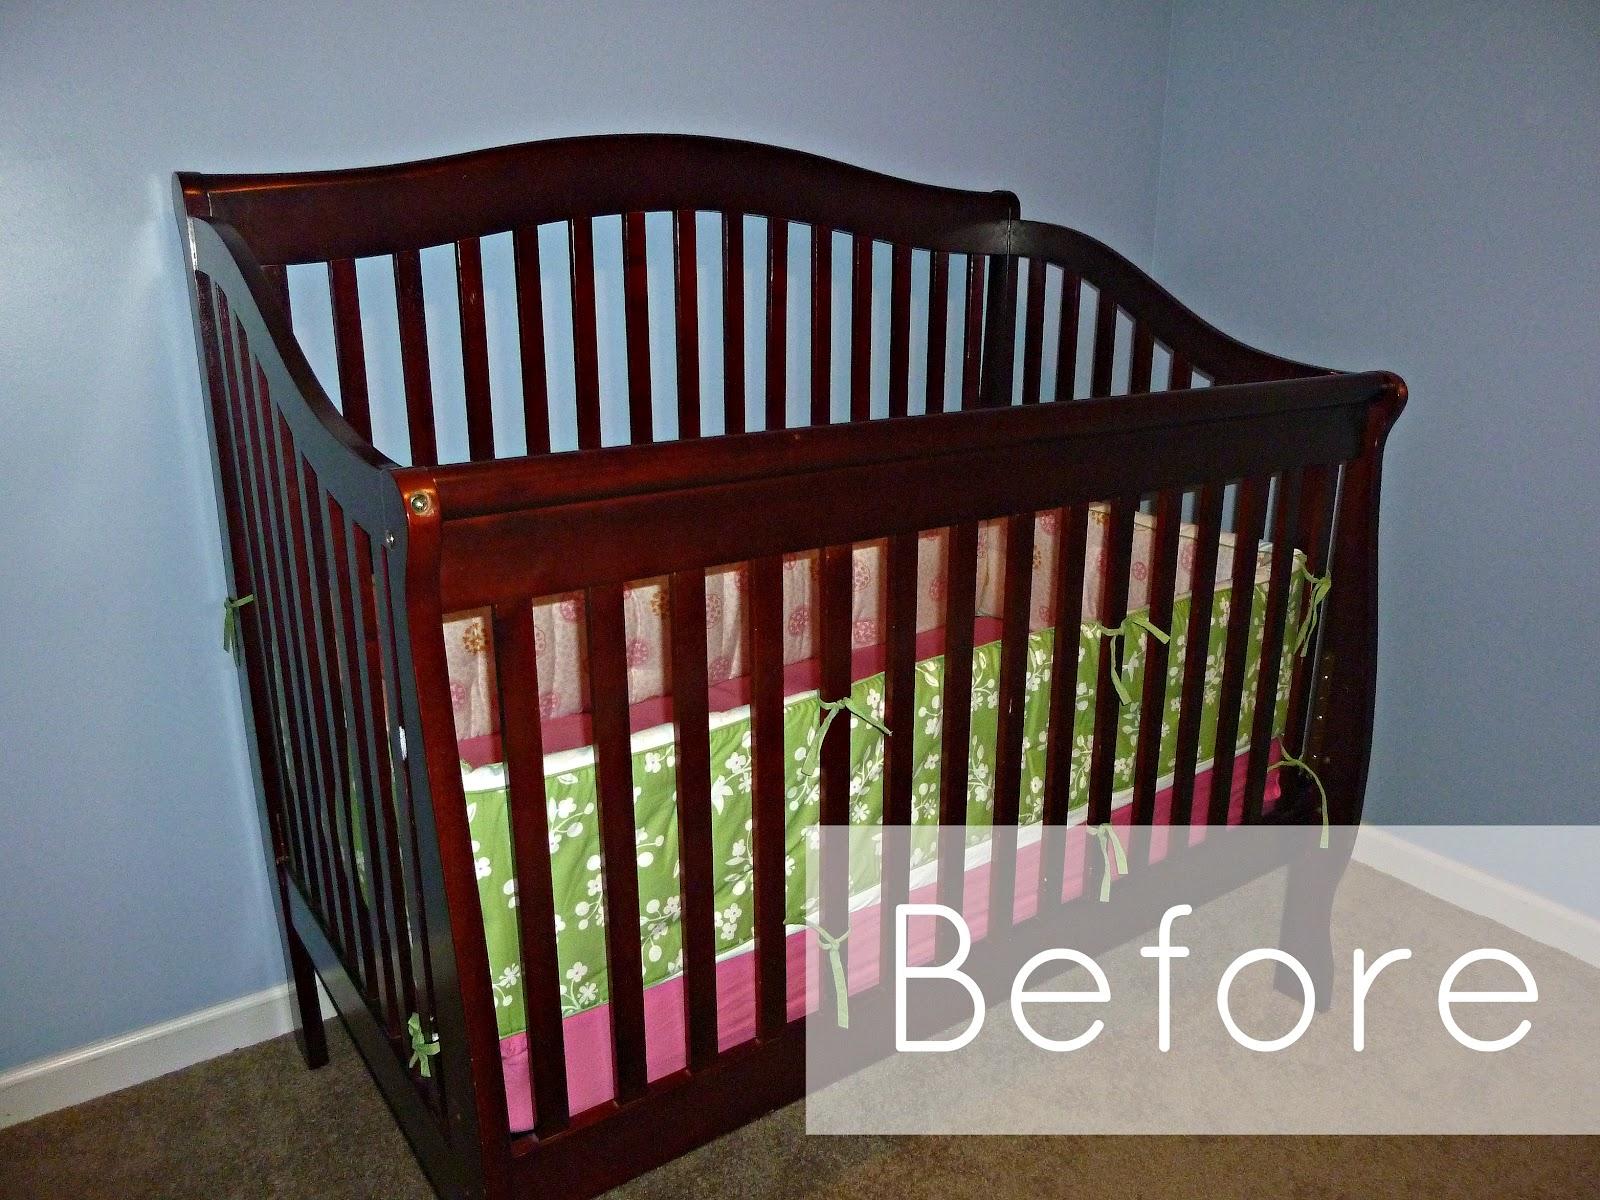 Baby cribs on craigslist - Spray Painted Crib